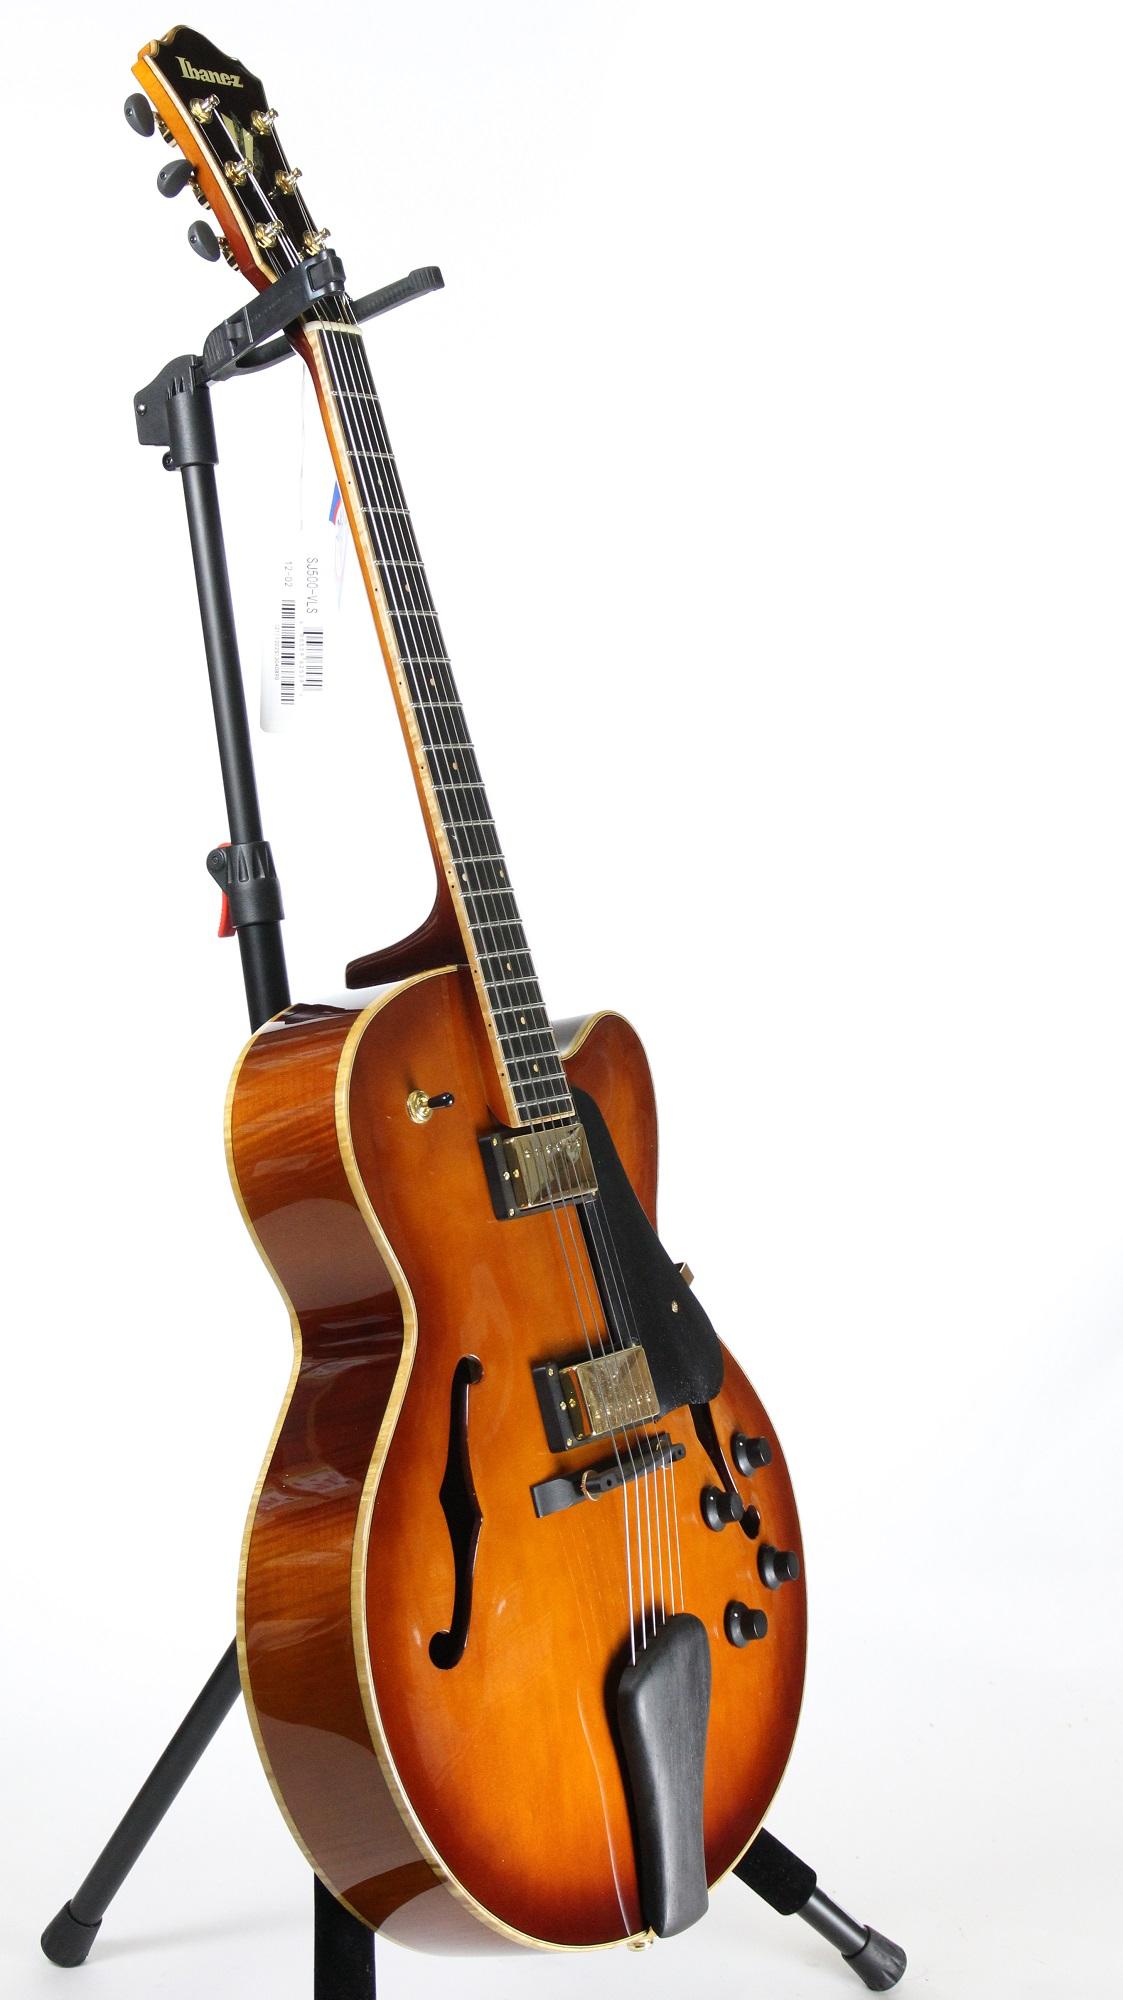 Full Hollow Body Guitar Full-hollow Body Electric